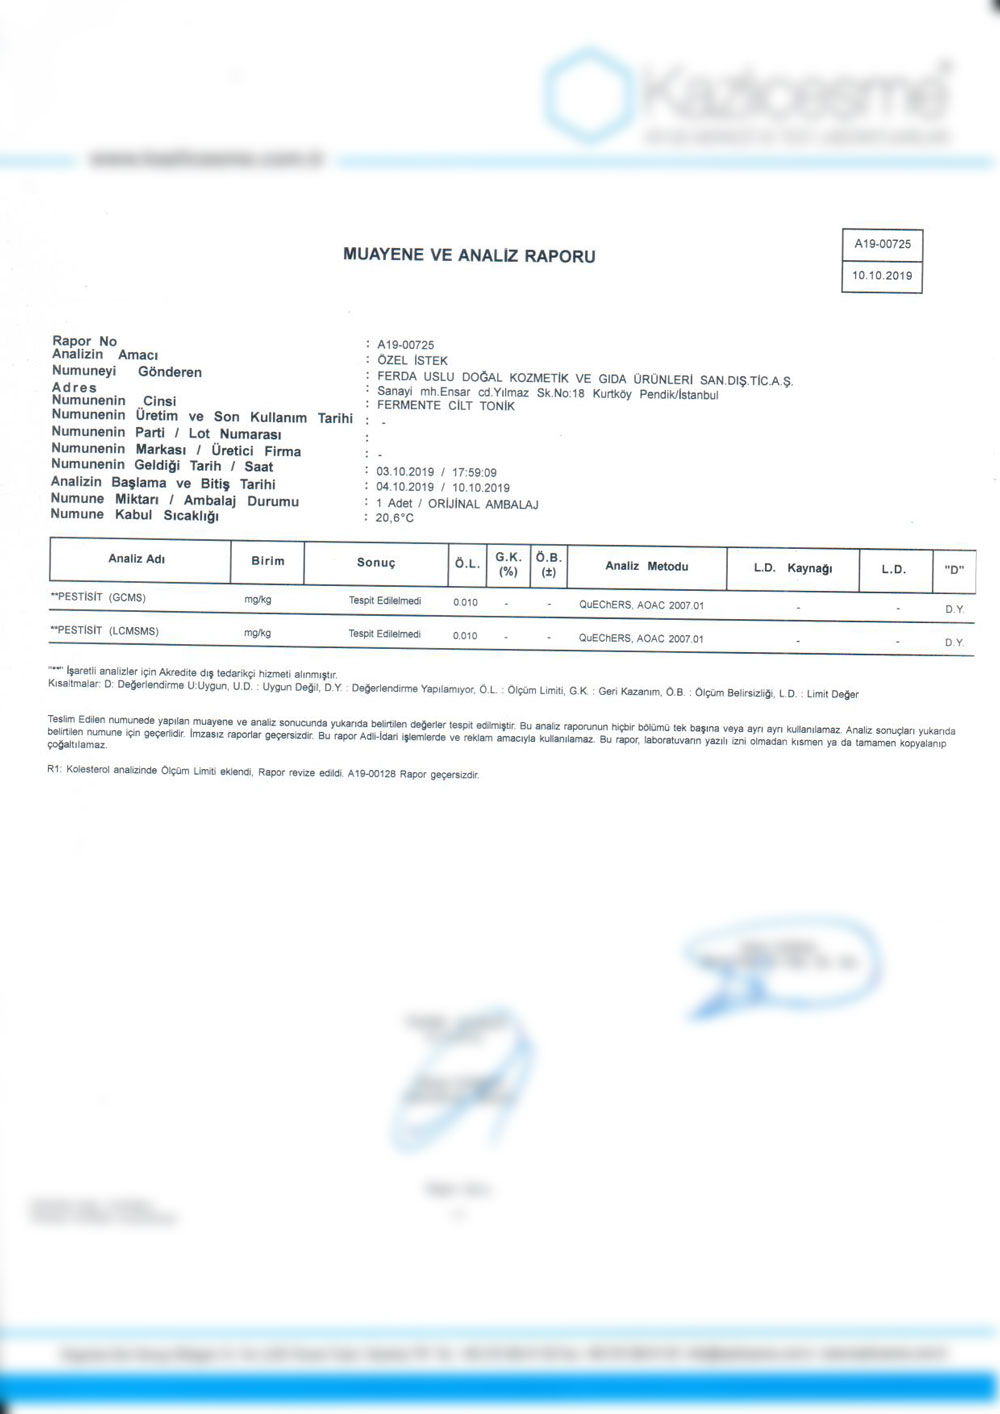 Fermente-Cilt-tonigi-pestisit.jpg (116 KB)